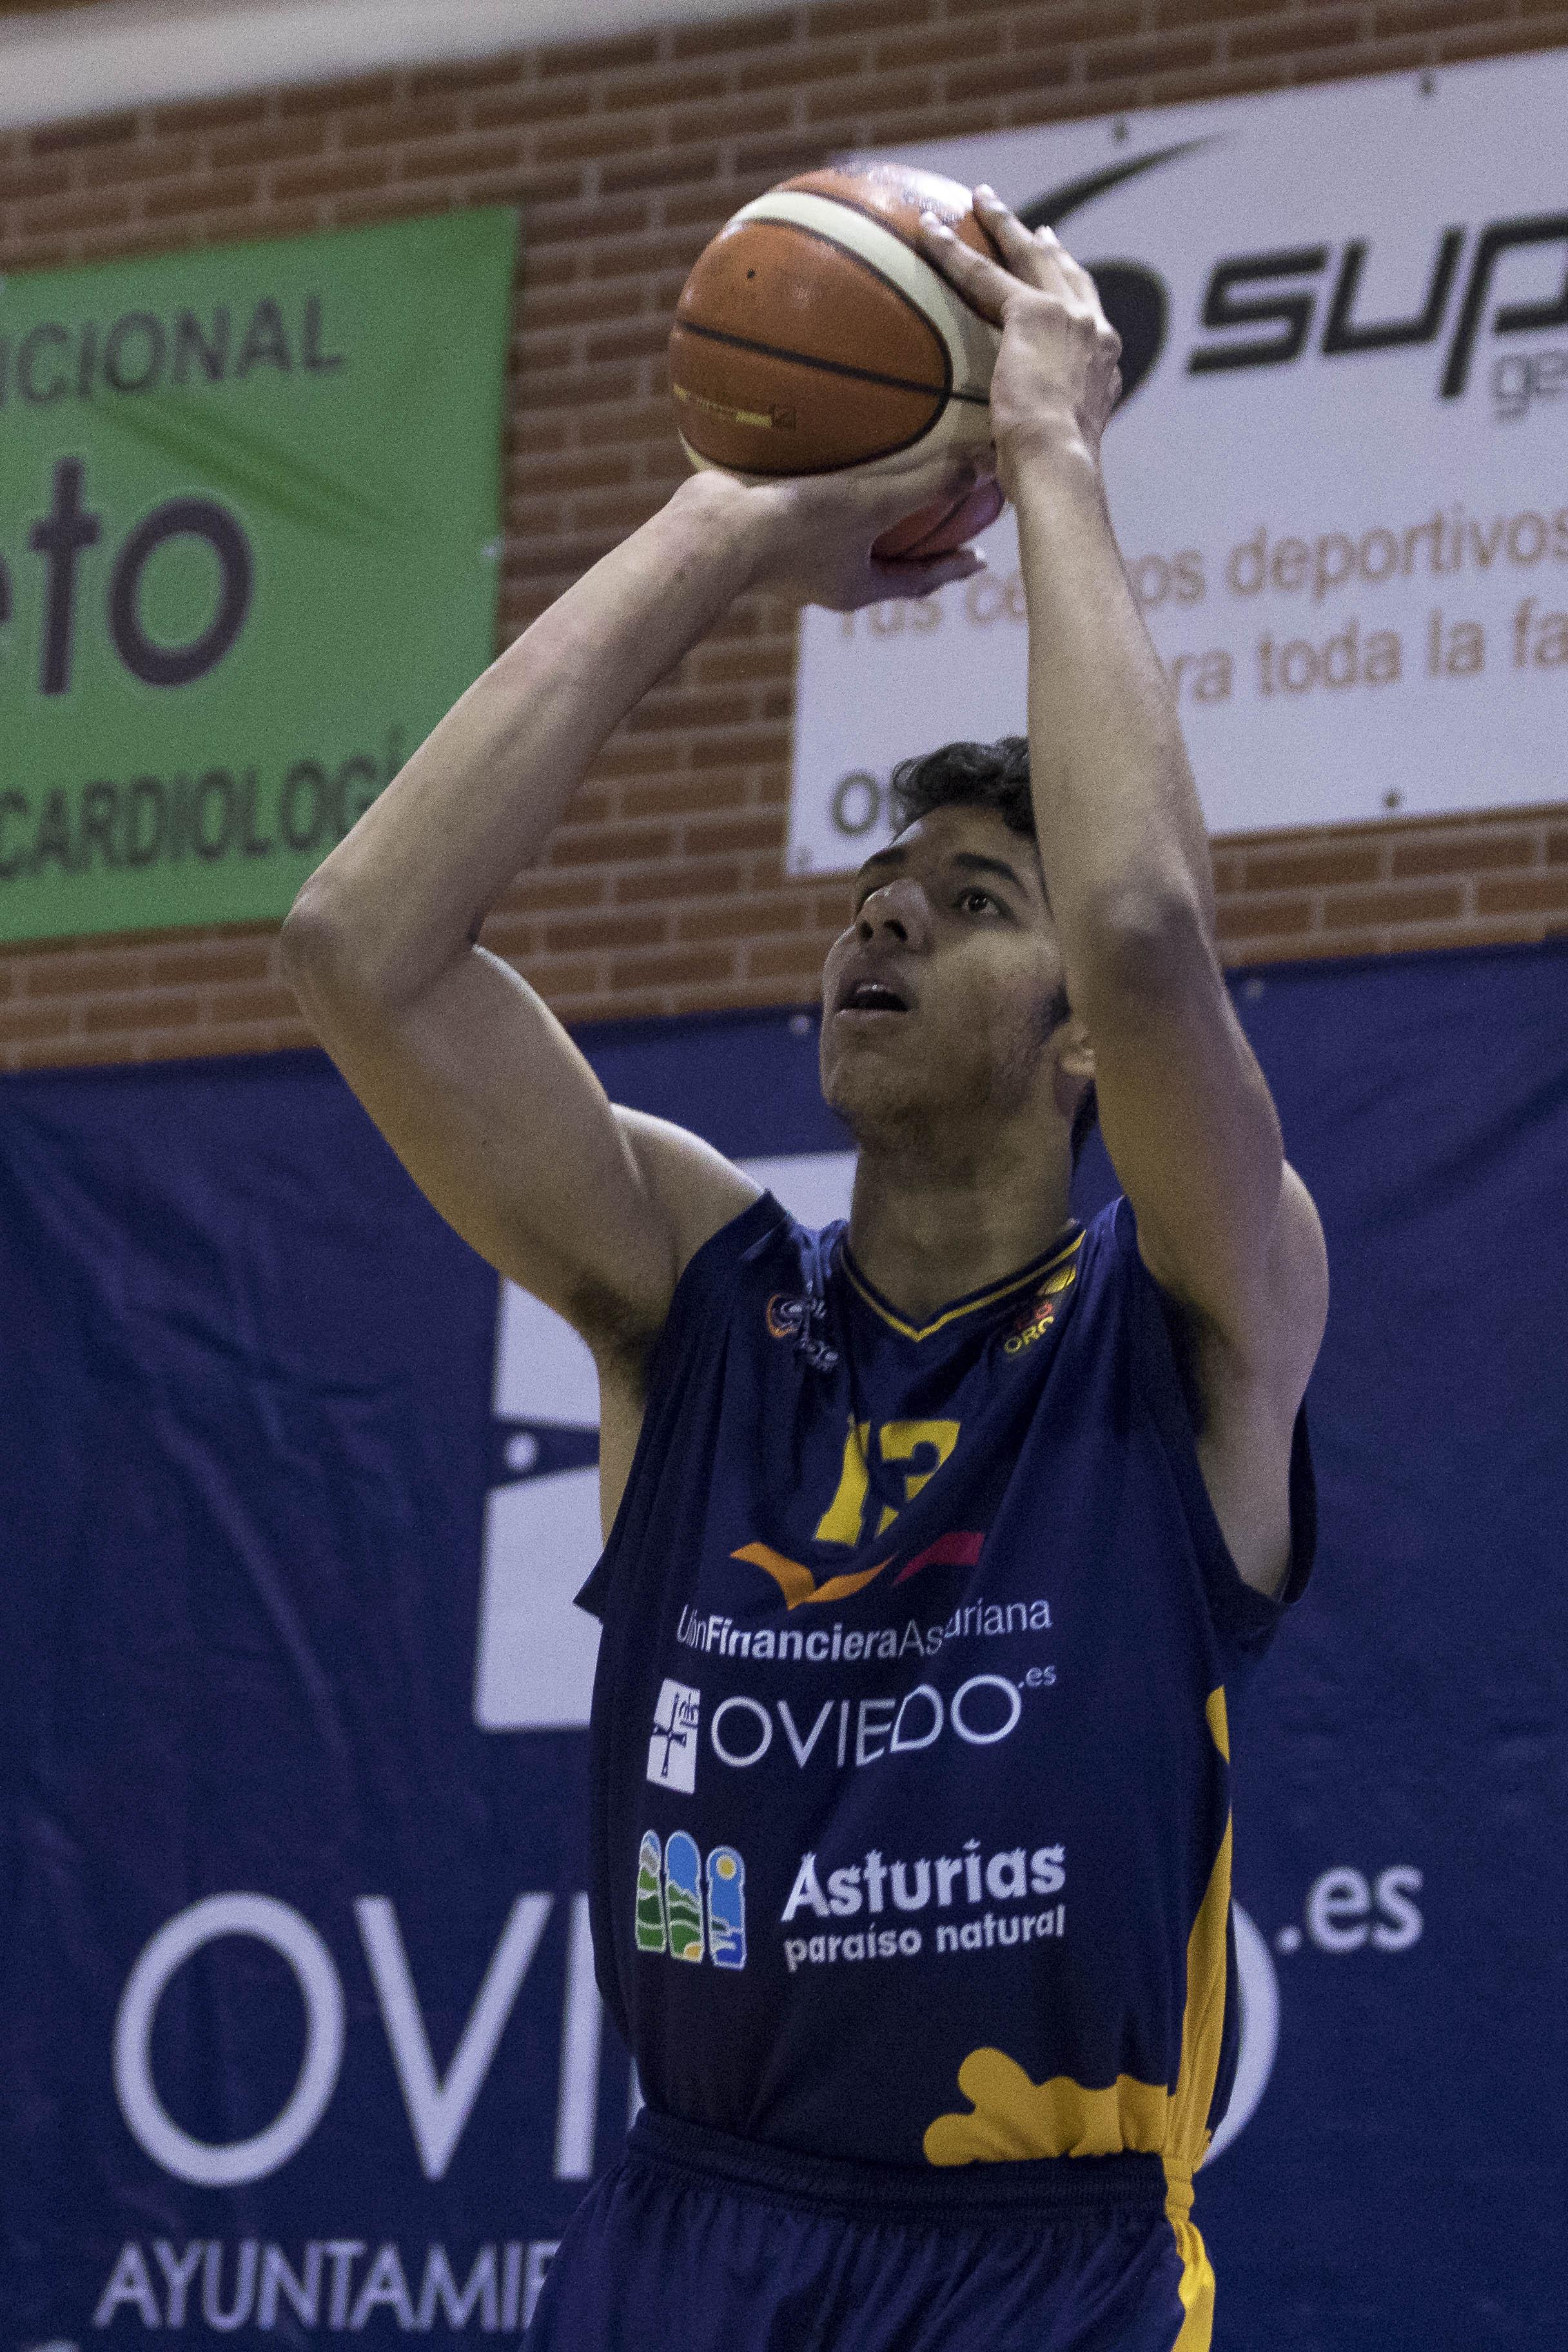 Felipe Dos Anjos desde media distancia (Foto: Christian García)